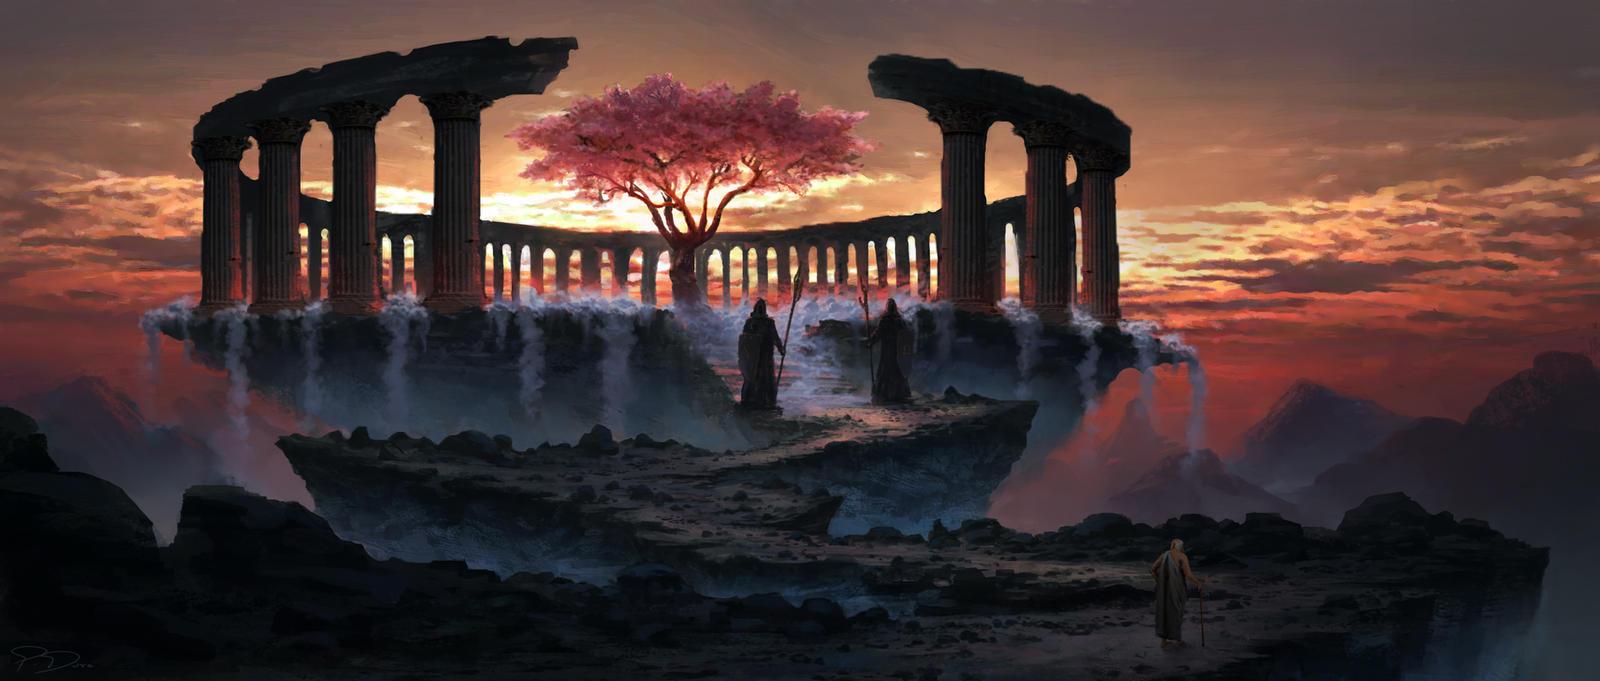 Tree of eternal youth by PiotrDura